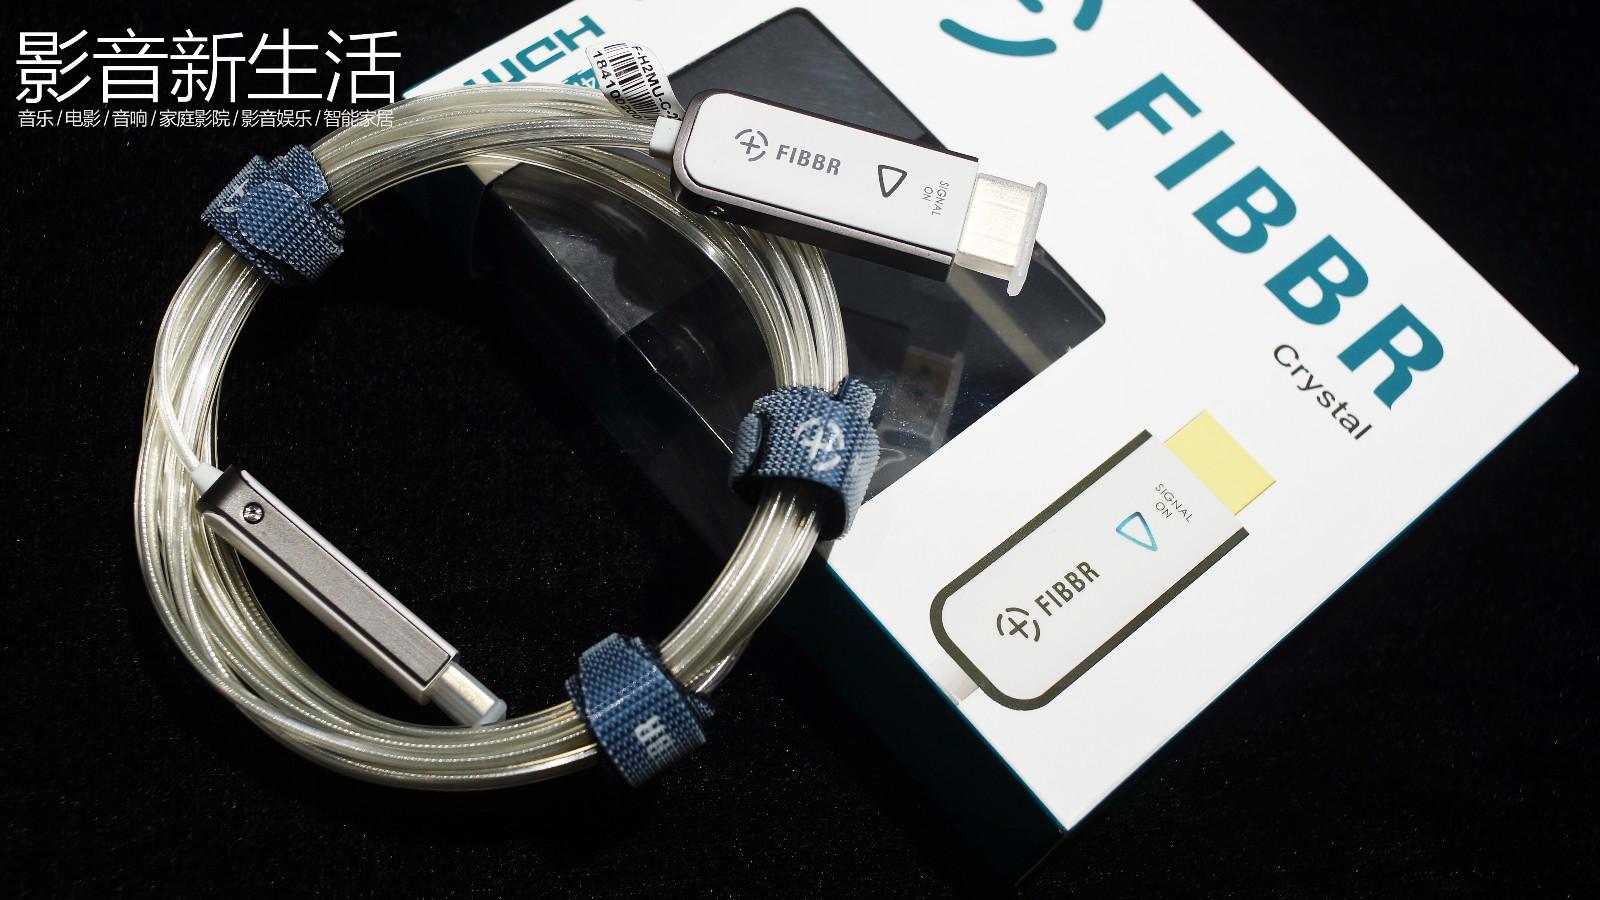 33C95610 1828 4CBD BB00 FE091A004711 - FIBBR 菲伯尔 Crystal HDMI 2.0线